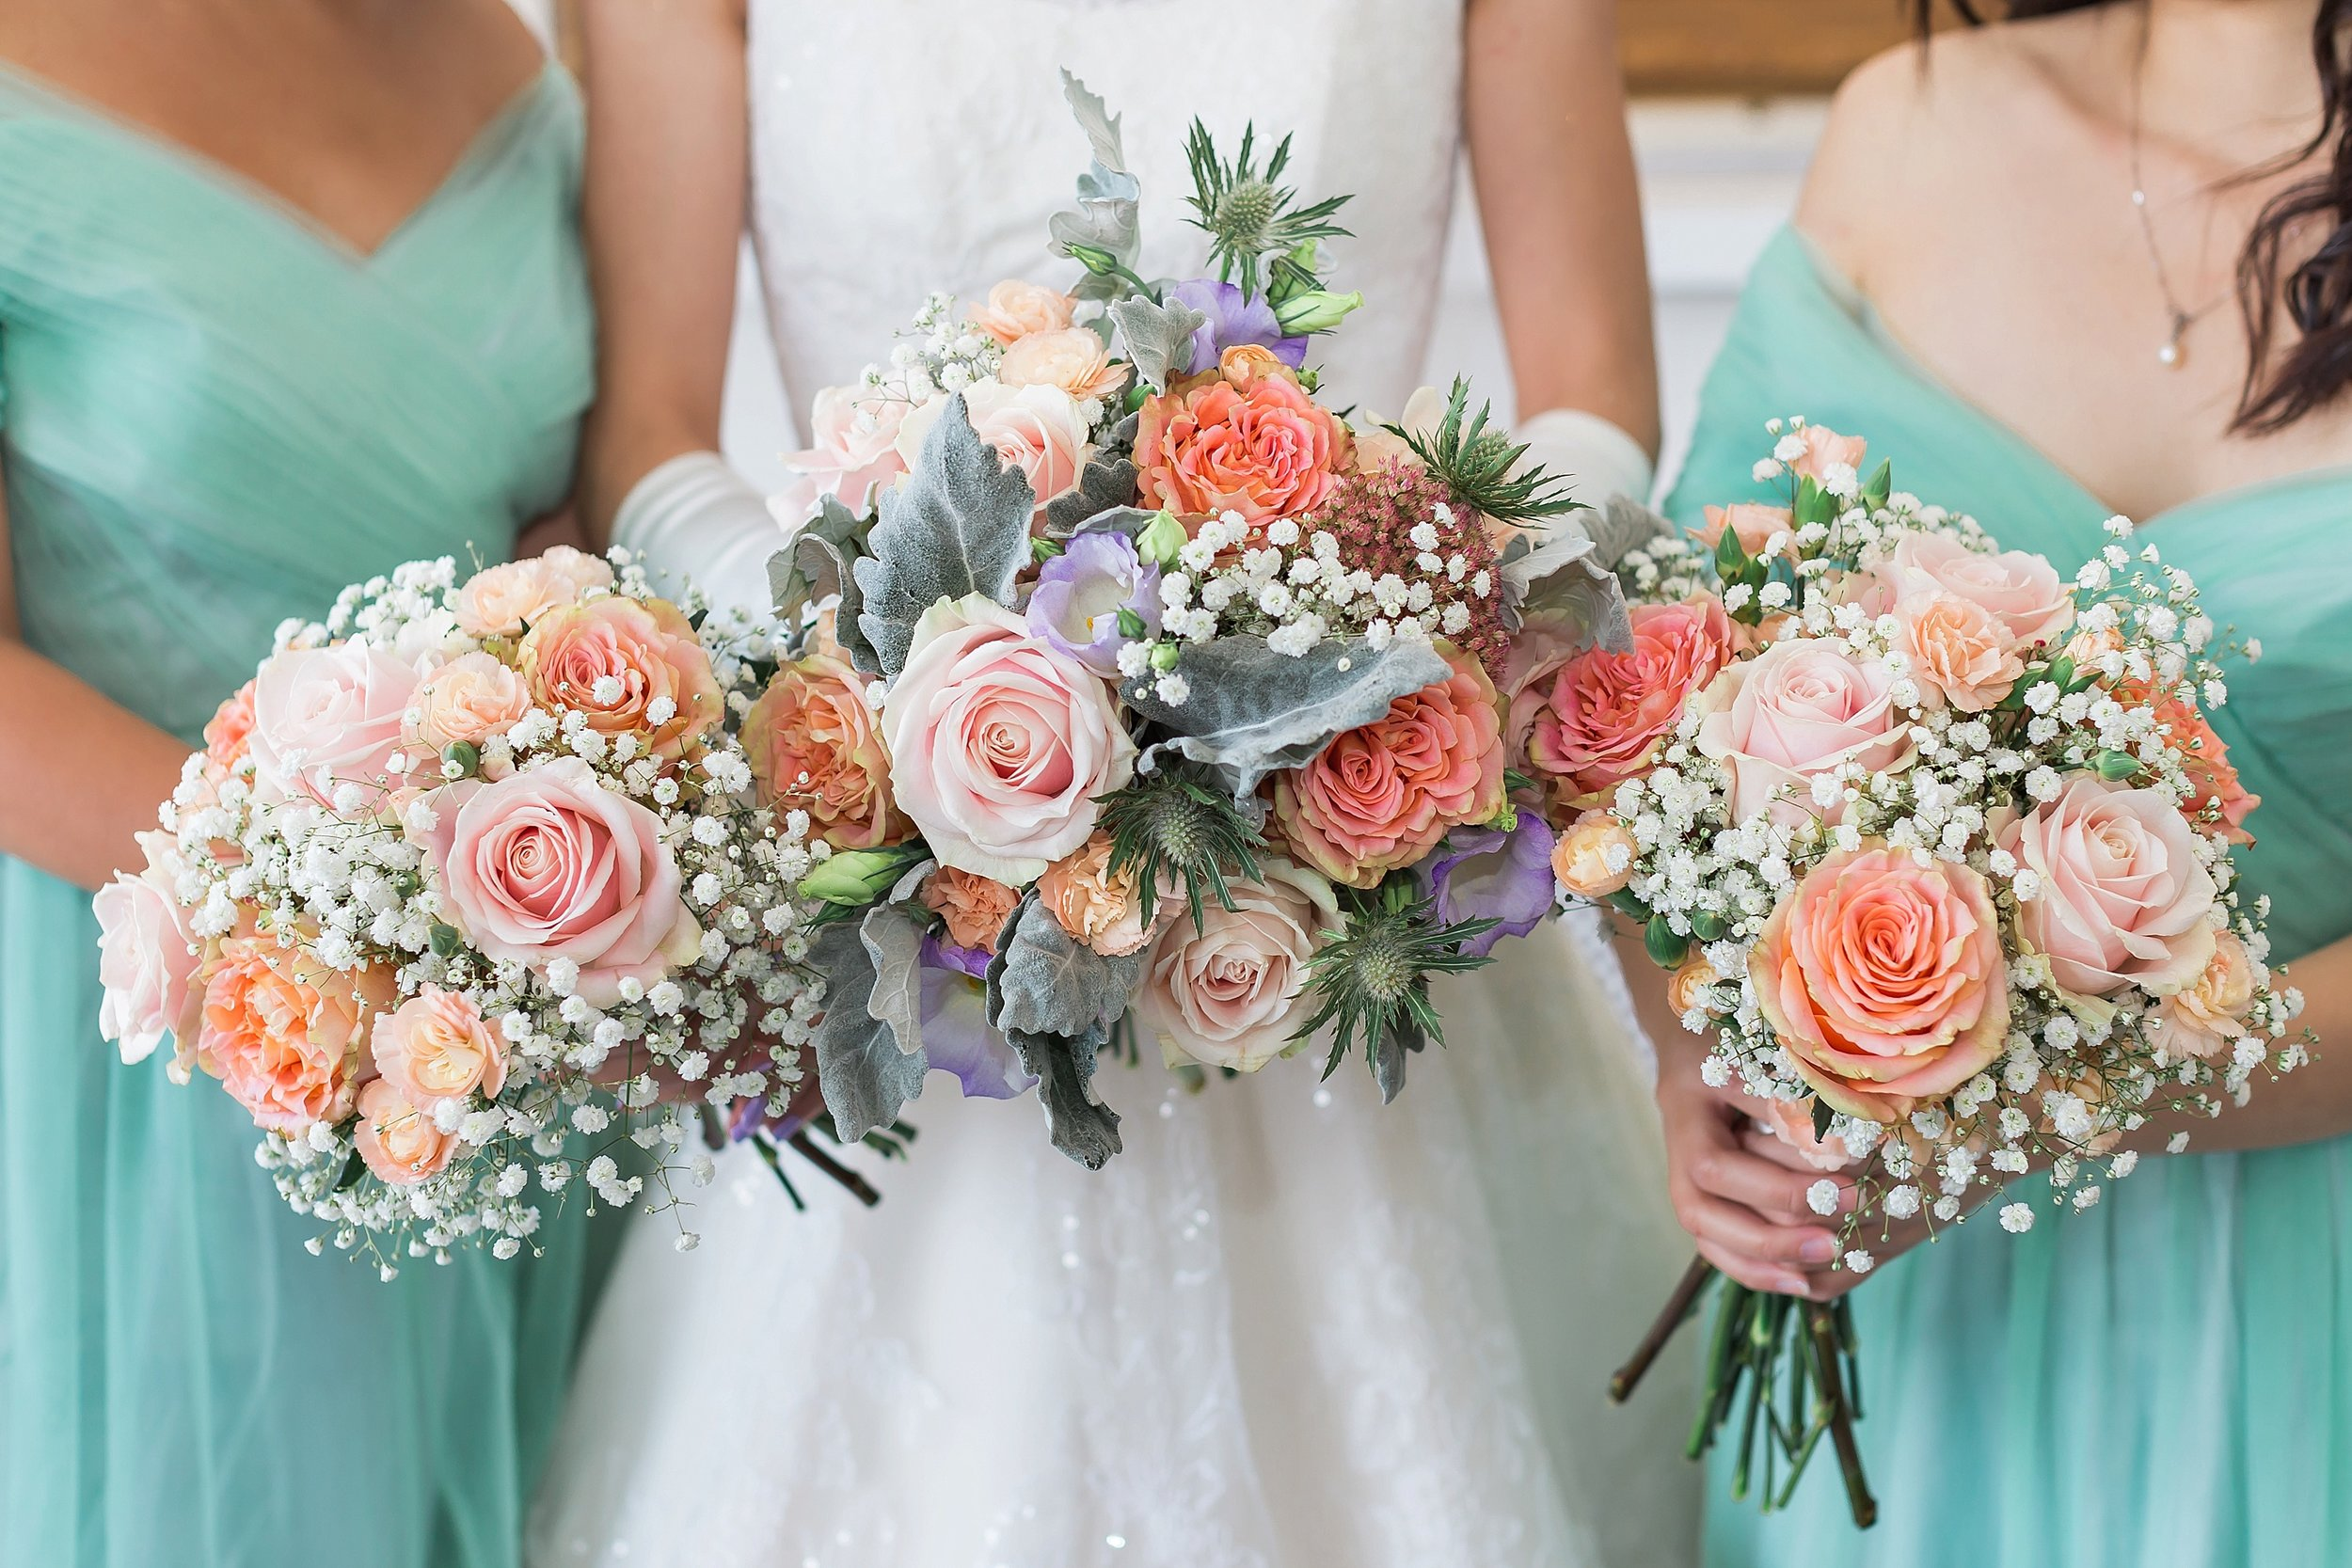 mint-and-blush-wedding-flowers.jpg